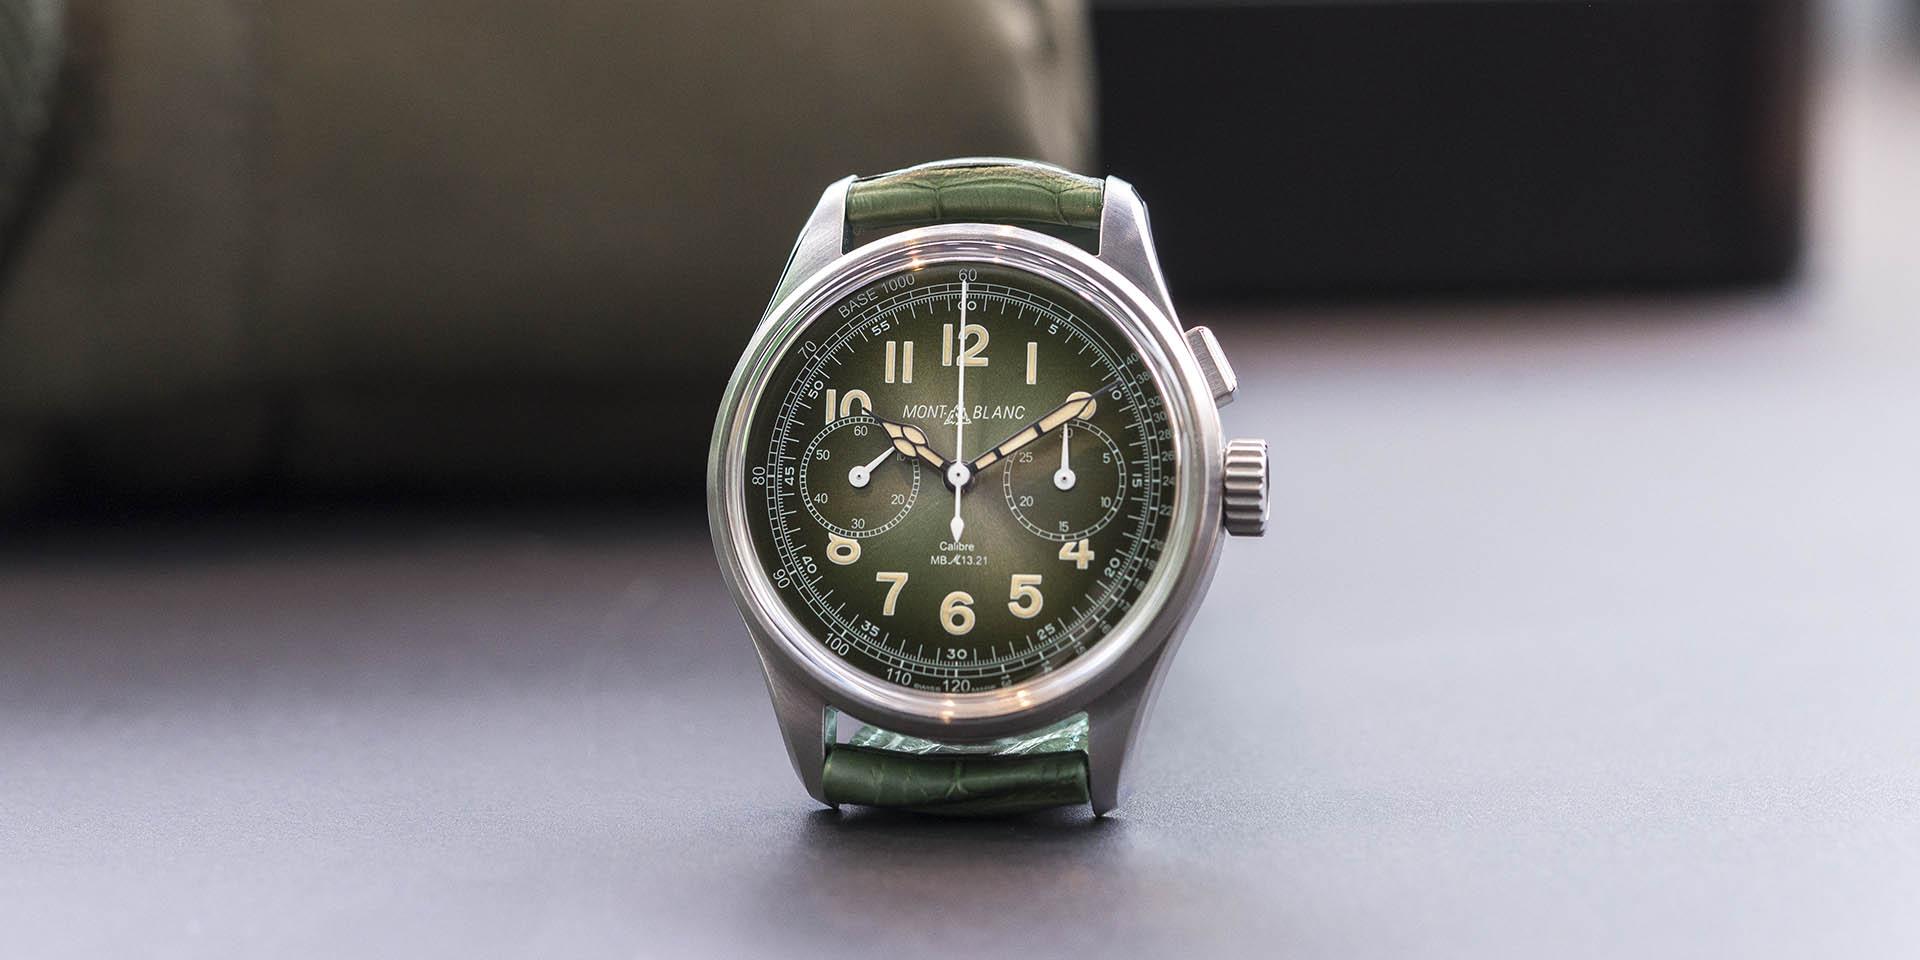 117834-Montblanc-1858-Monopusher-Chronograph-Sihh-2018-1.jpg